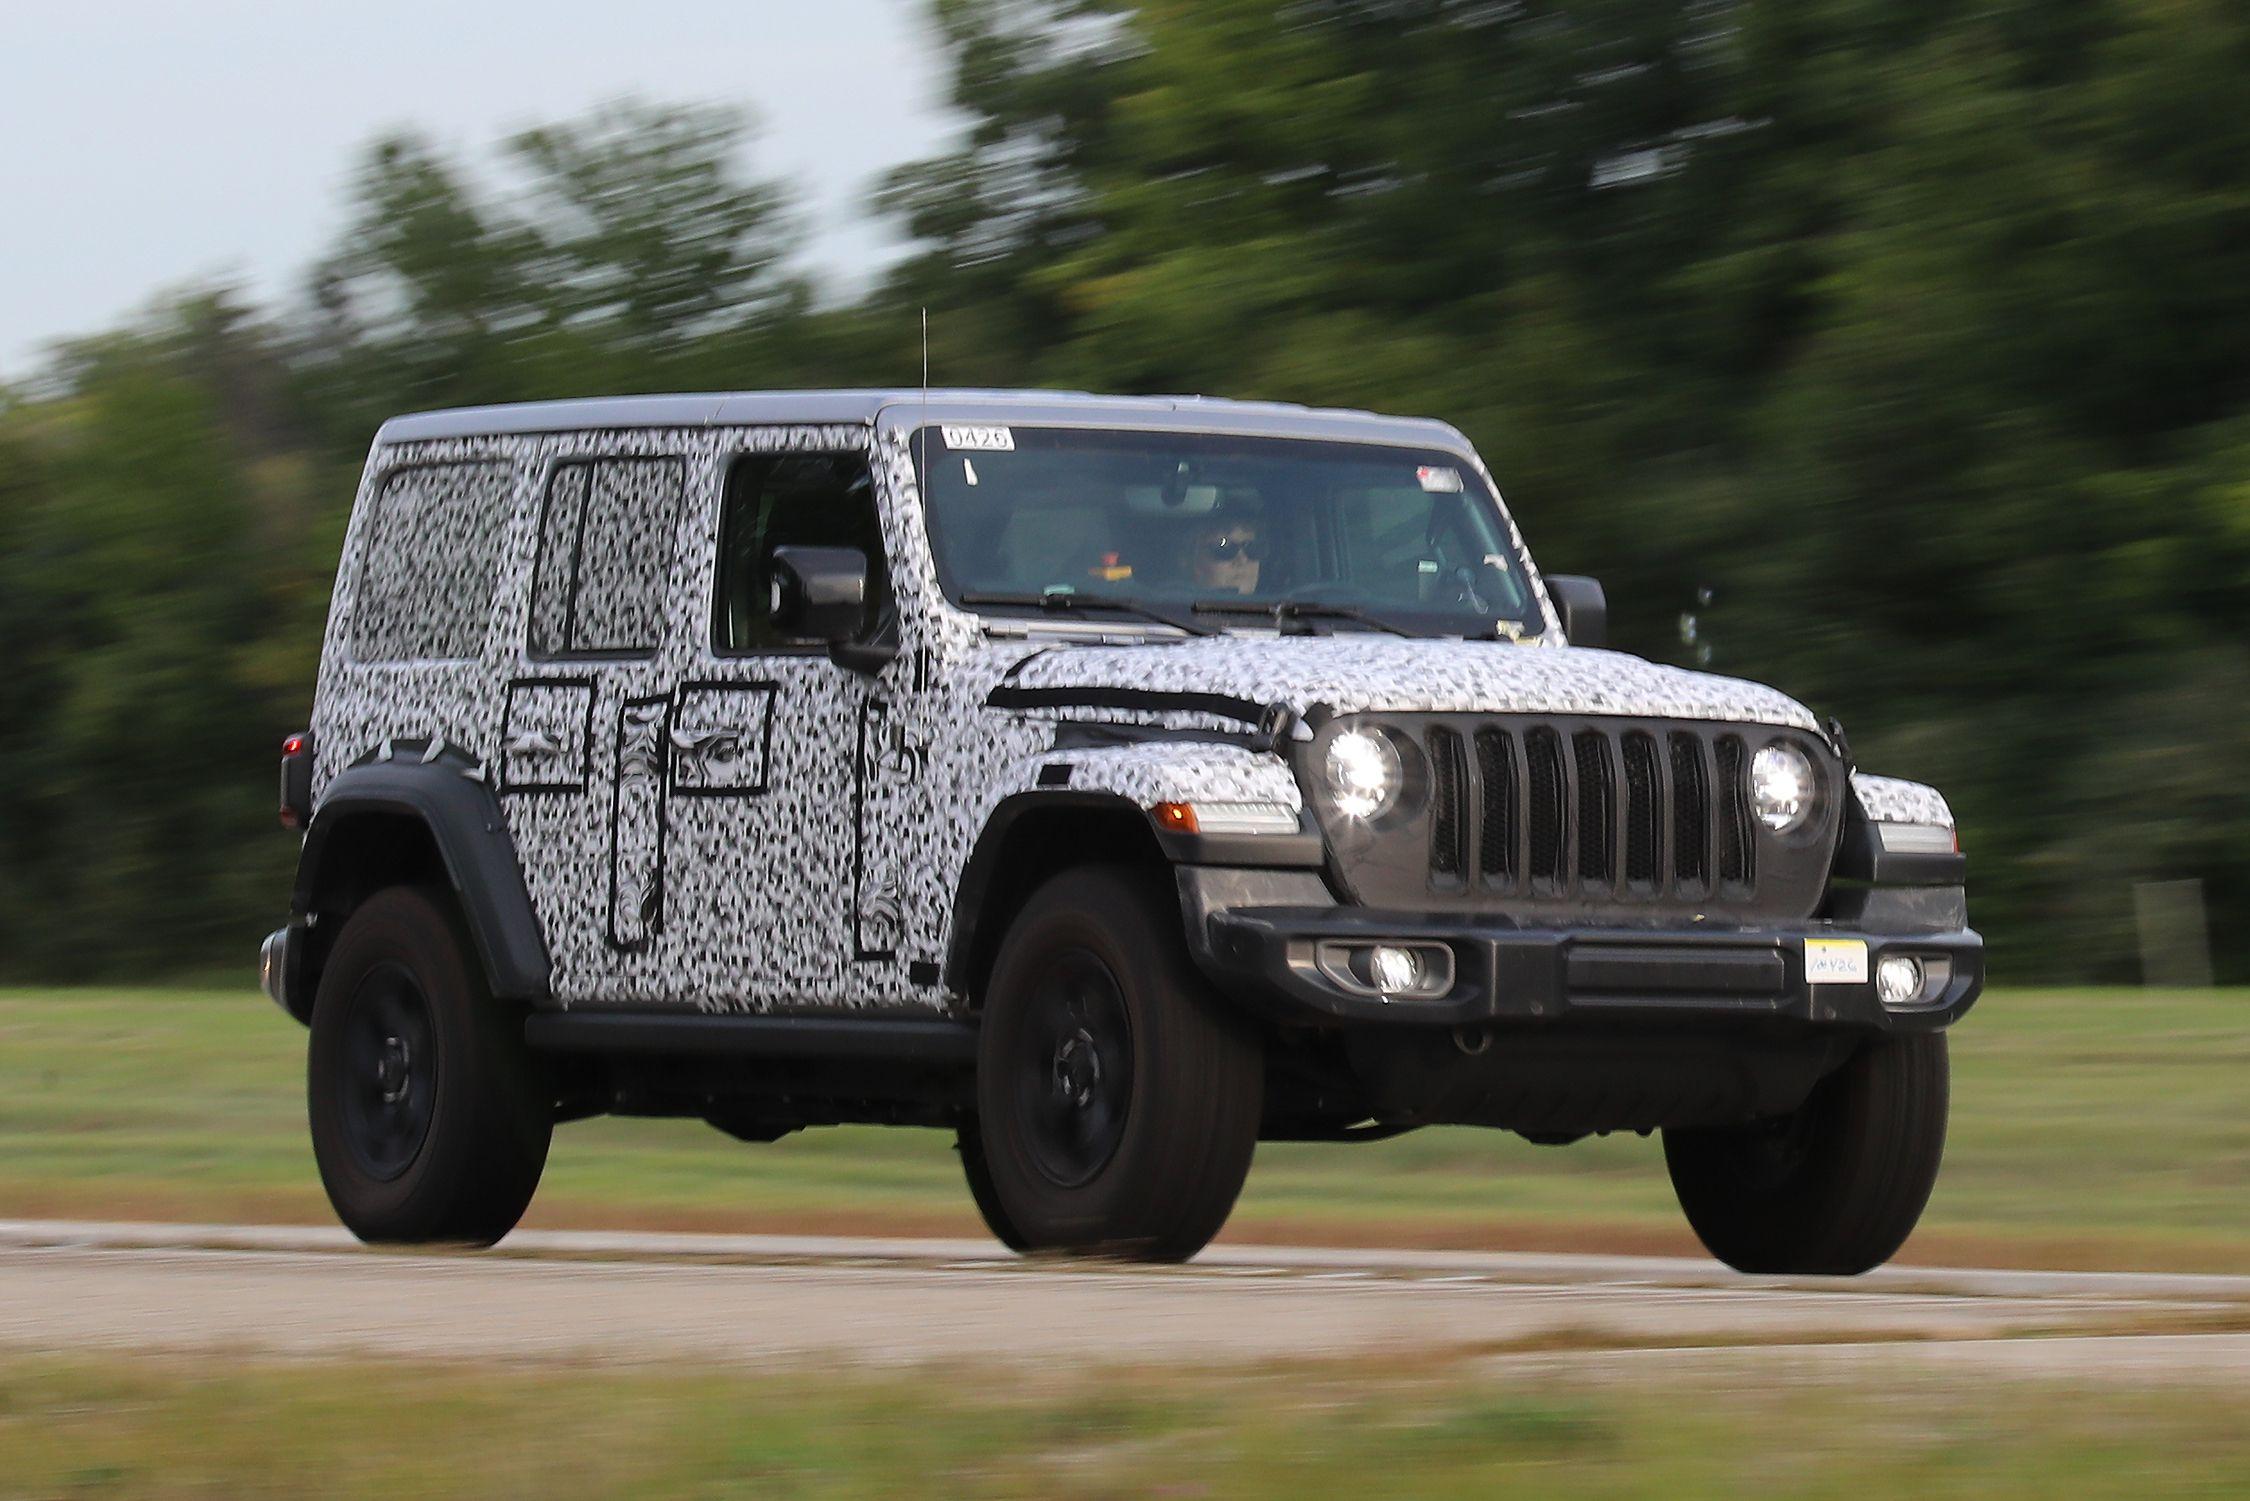 High Quality 2018 Jeep Wrangler Spy Shots